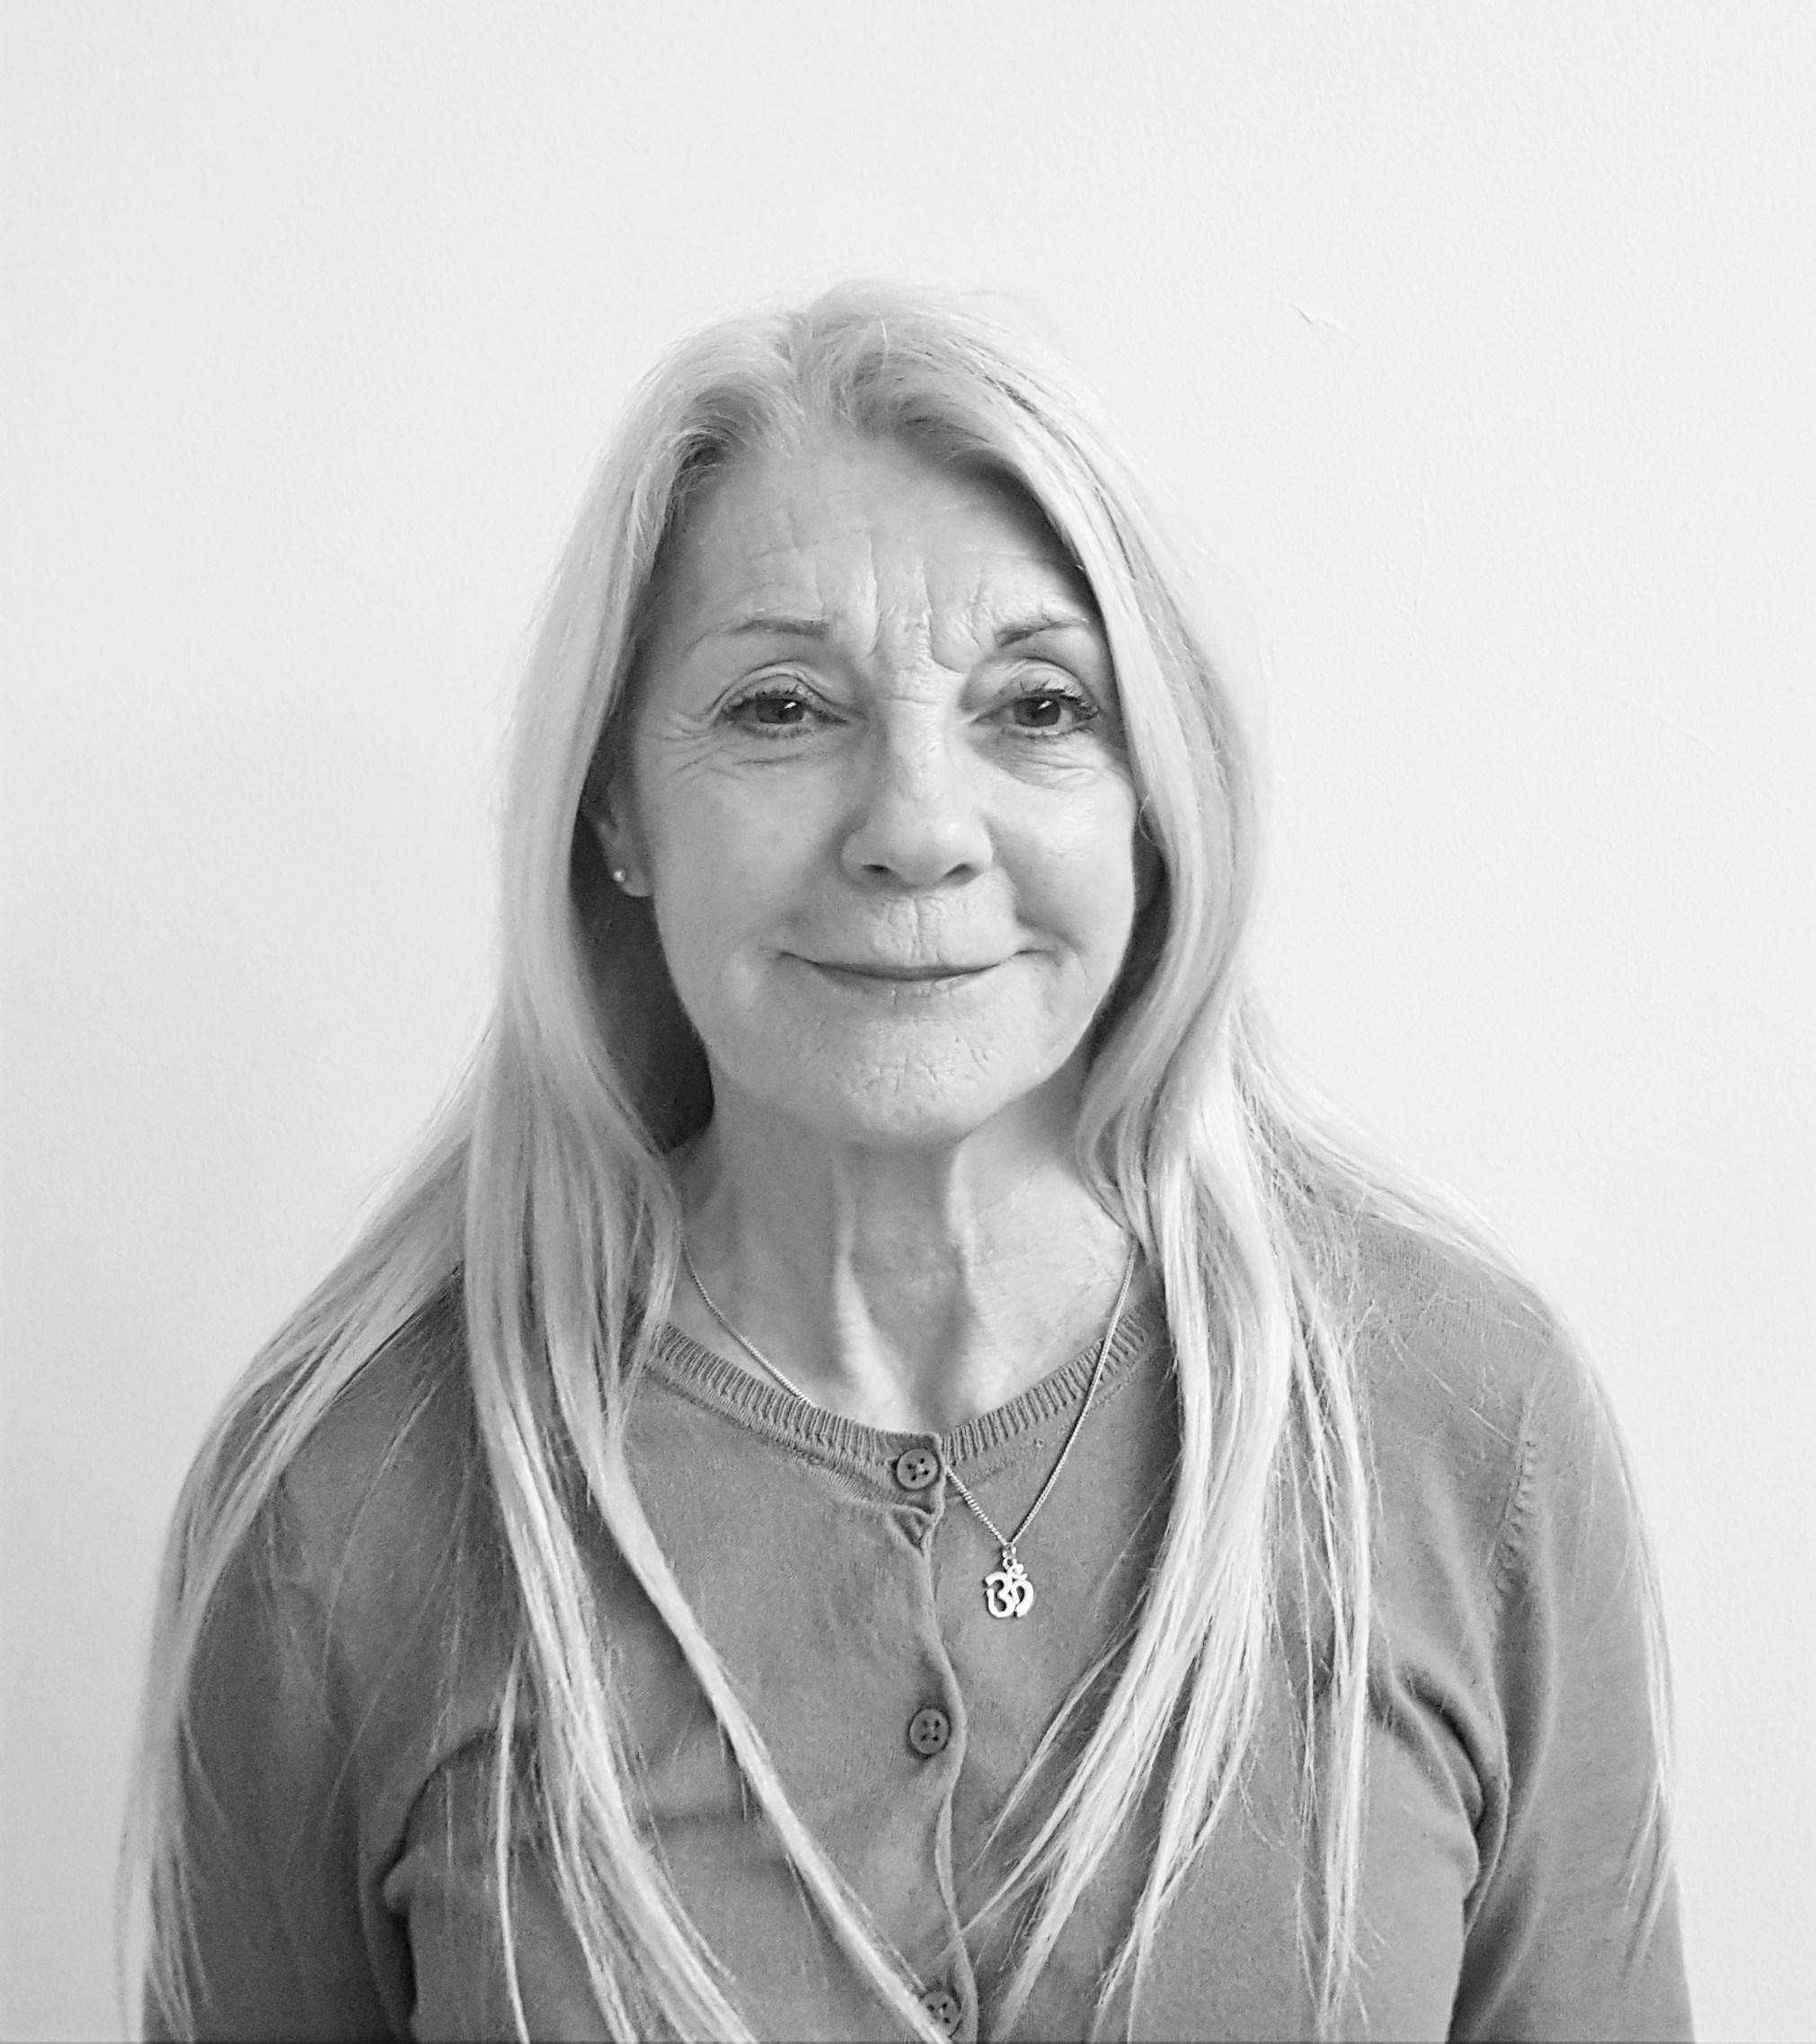 Maureen Karnowski